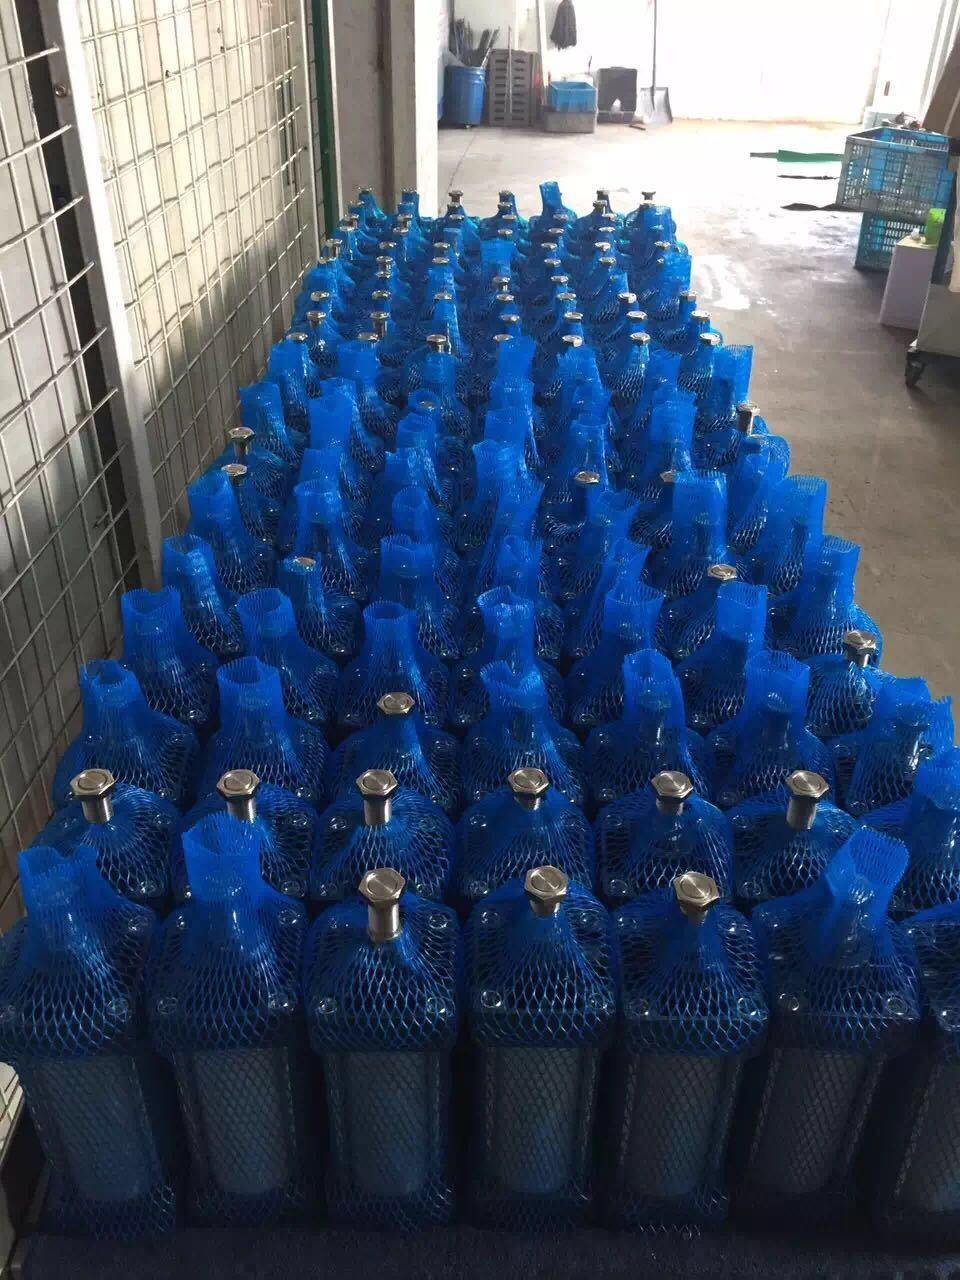 Dopow Sda32-20 Pneumatic Cylinder Compact Cylinder